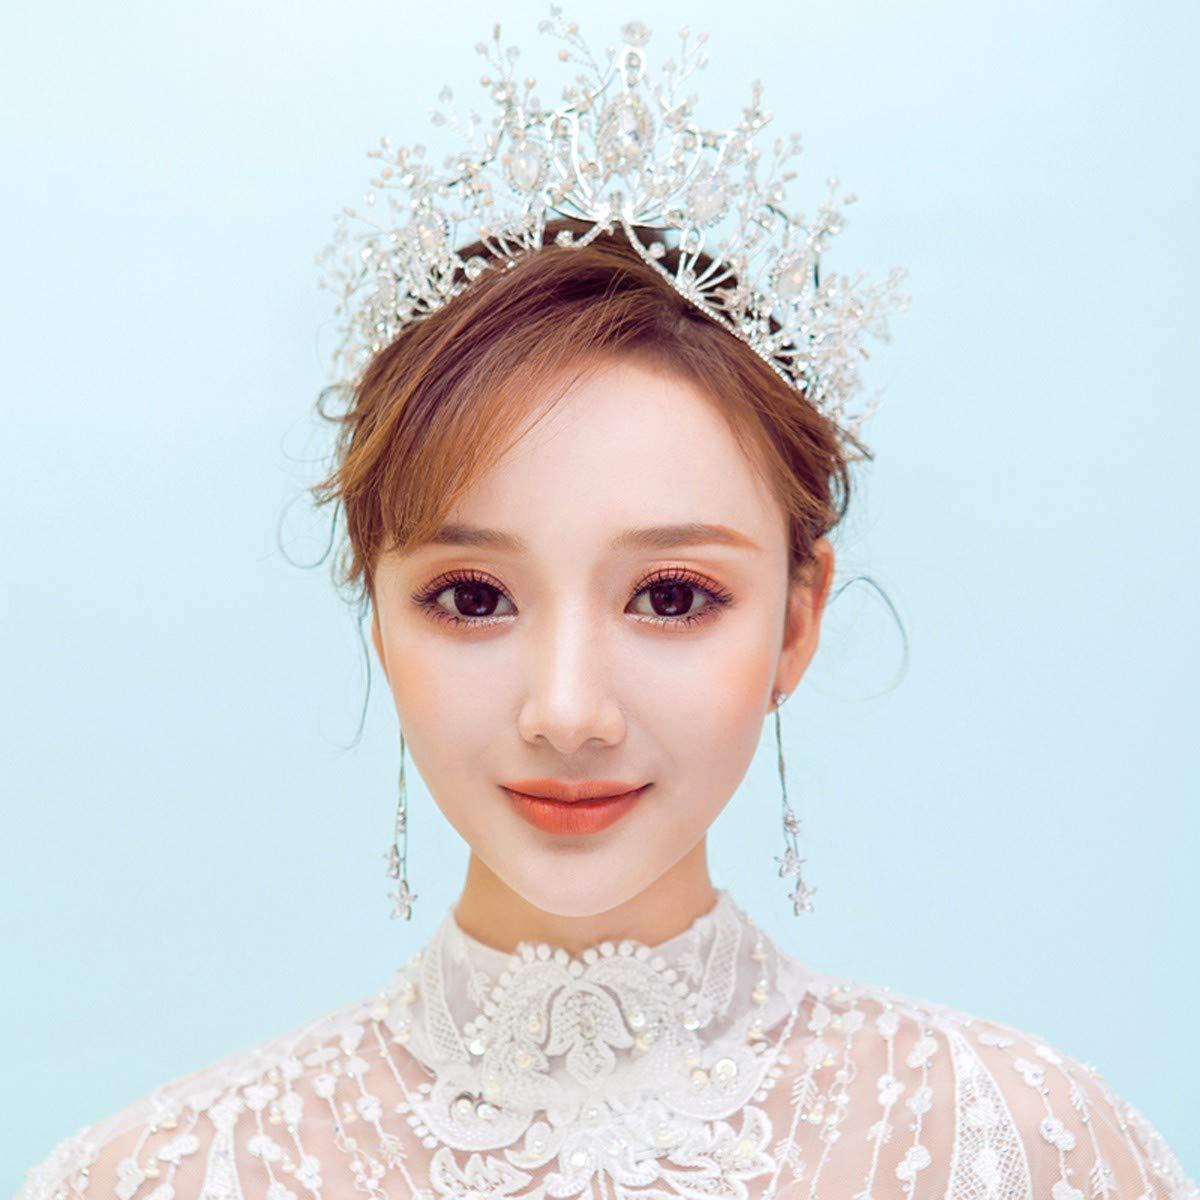 Girls Crown, Beautiful headdress/Bridal Crown Accessories Crown 2 Wedding Accessories by Zehaer (Image #2)